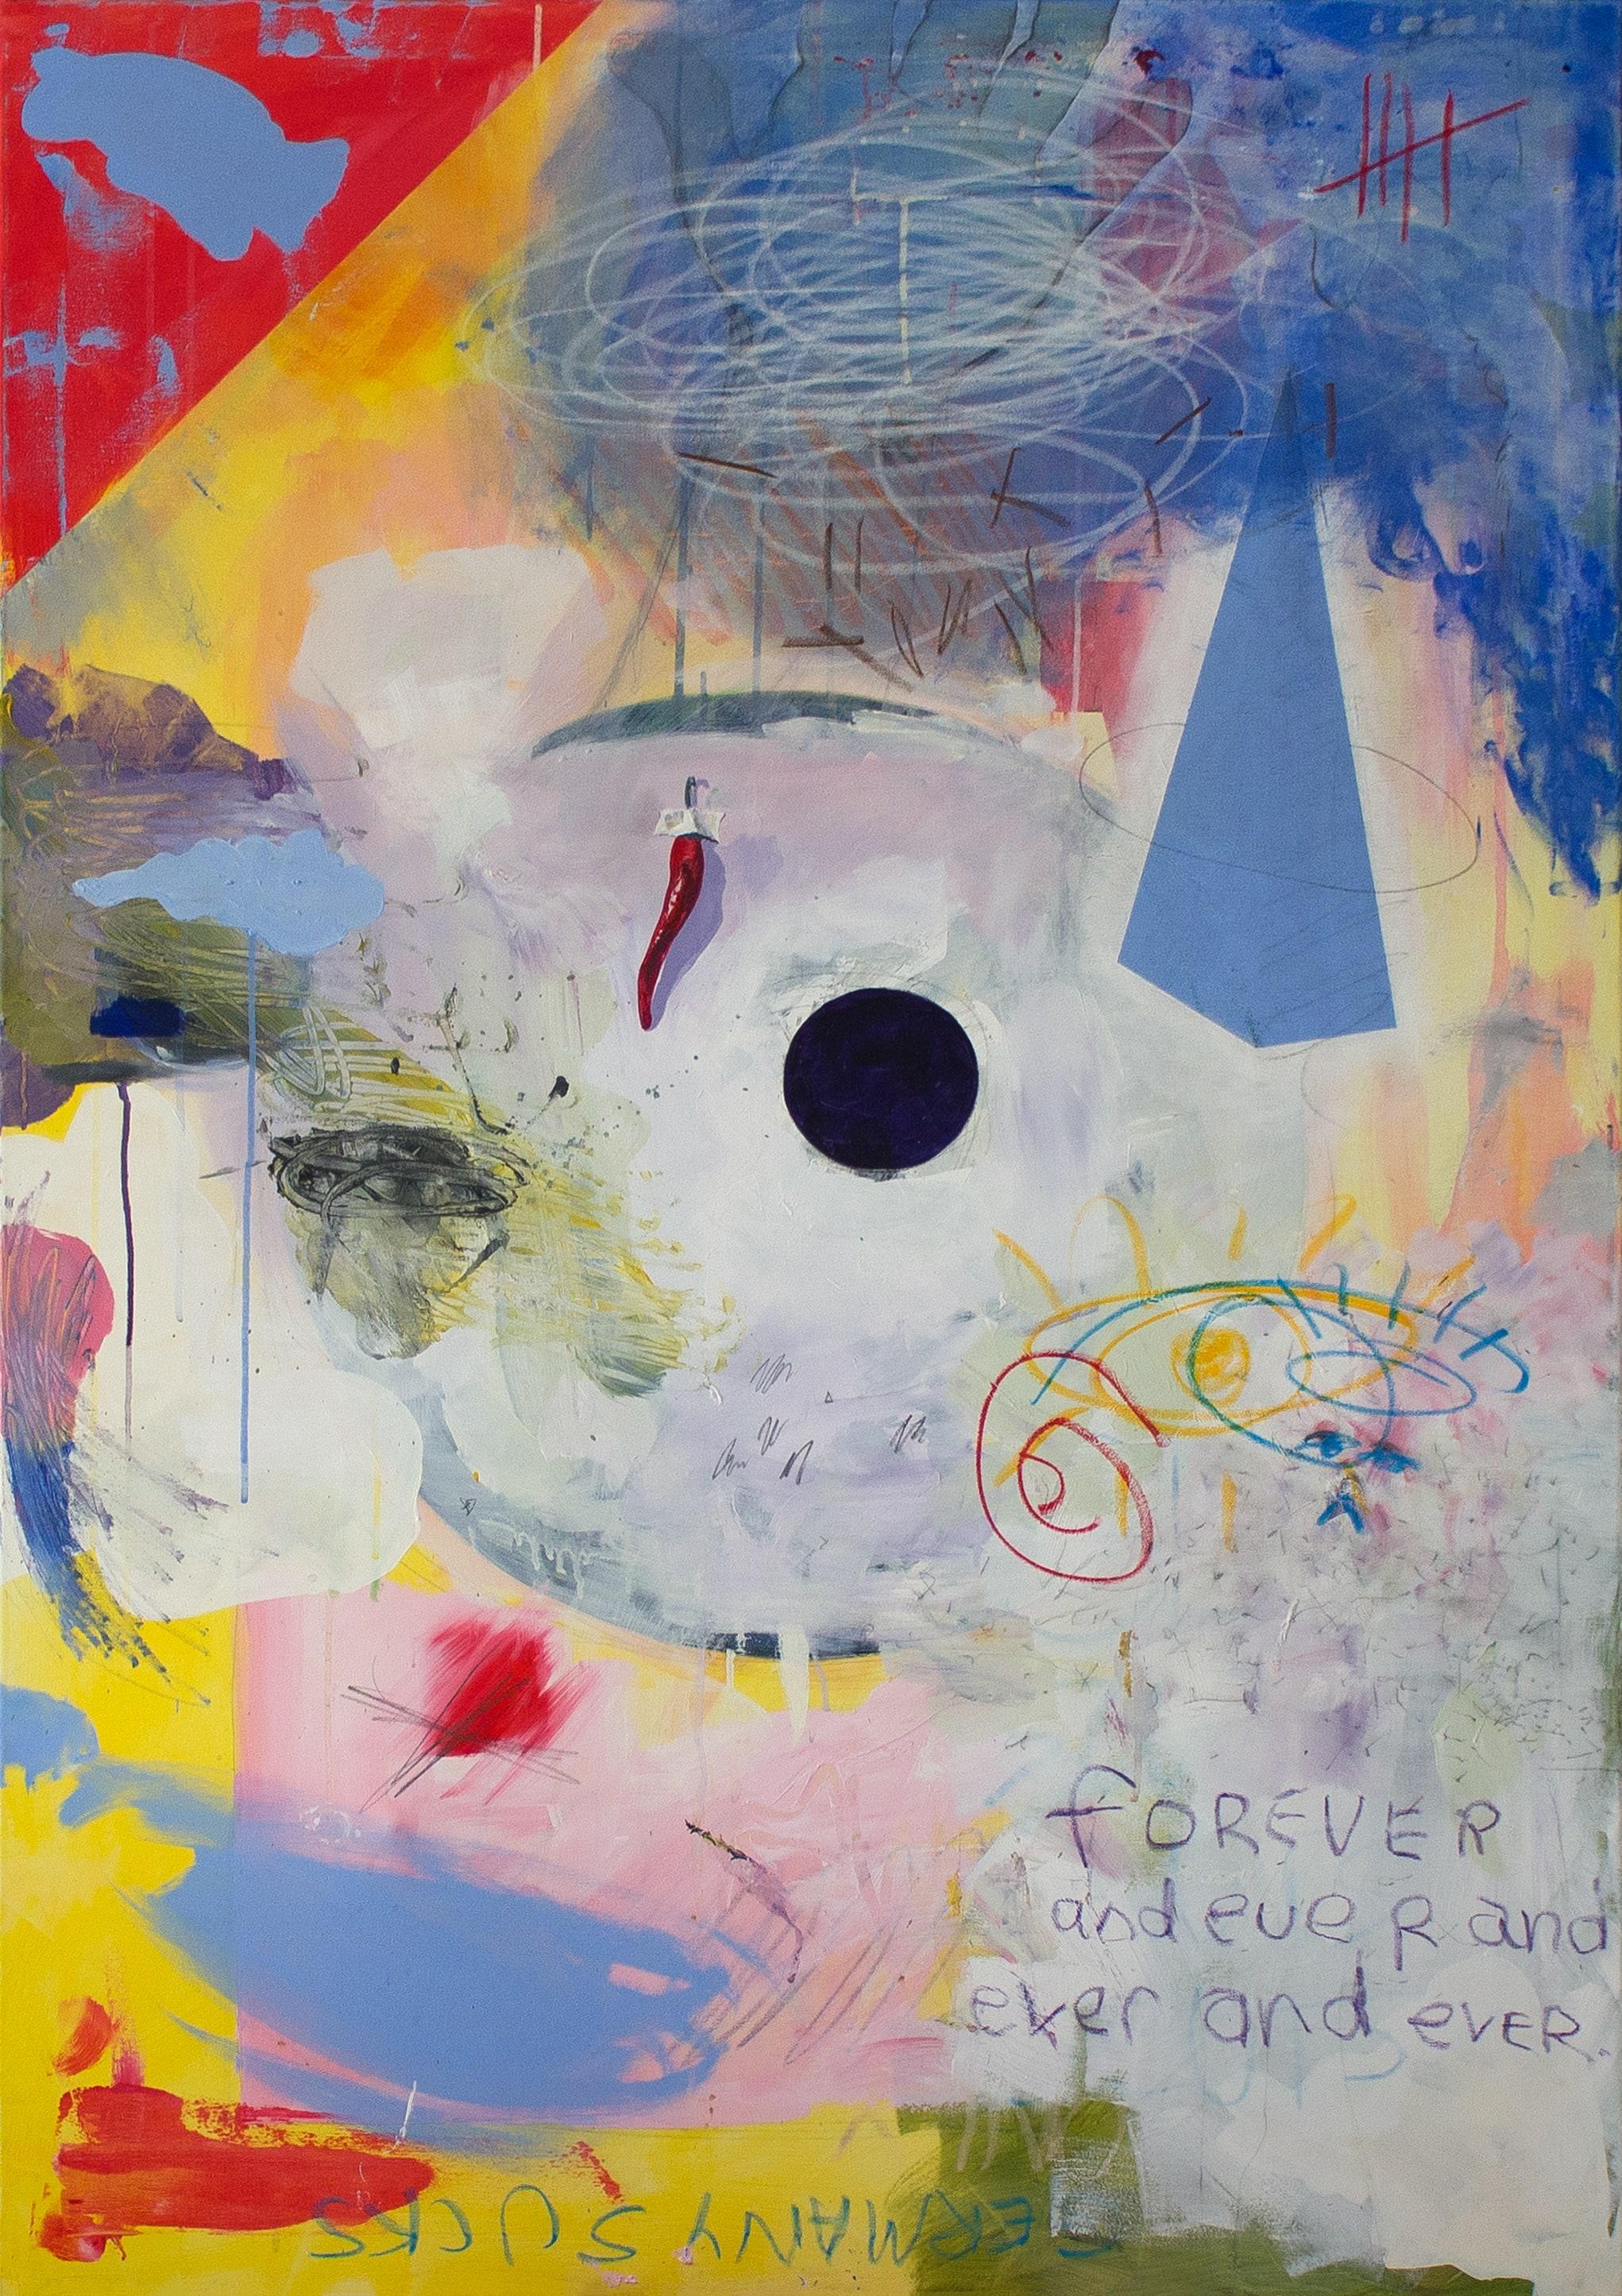 germany sucks  Acrylic, graphite, oil pastel on canvas 100 x 150 cm